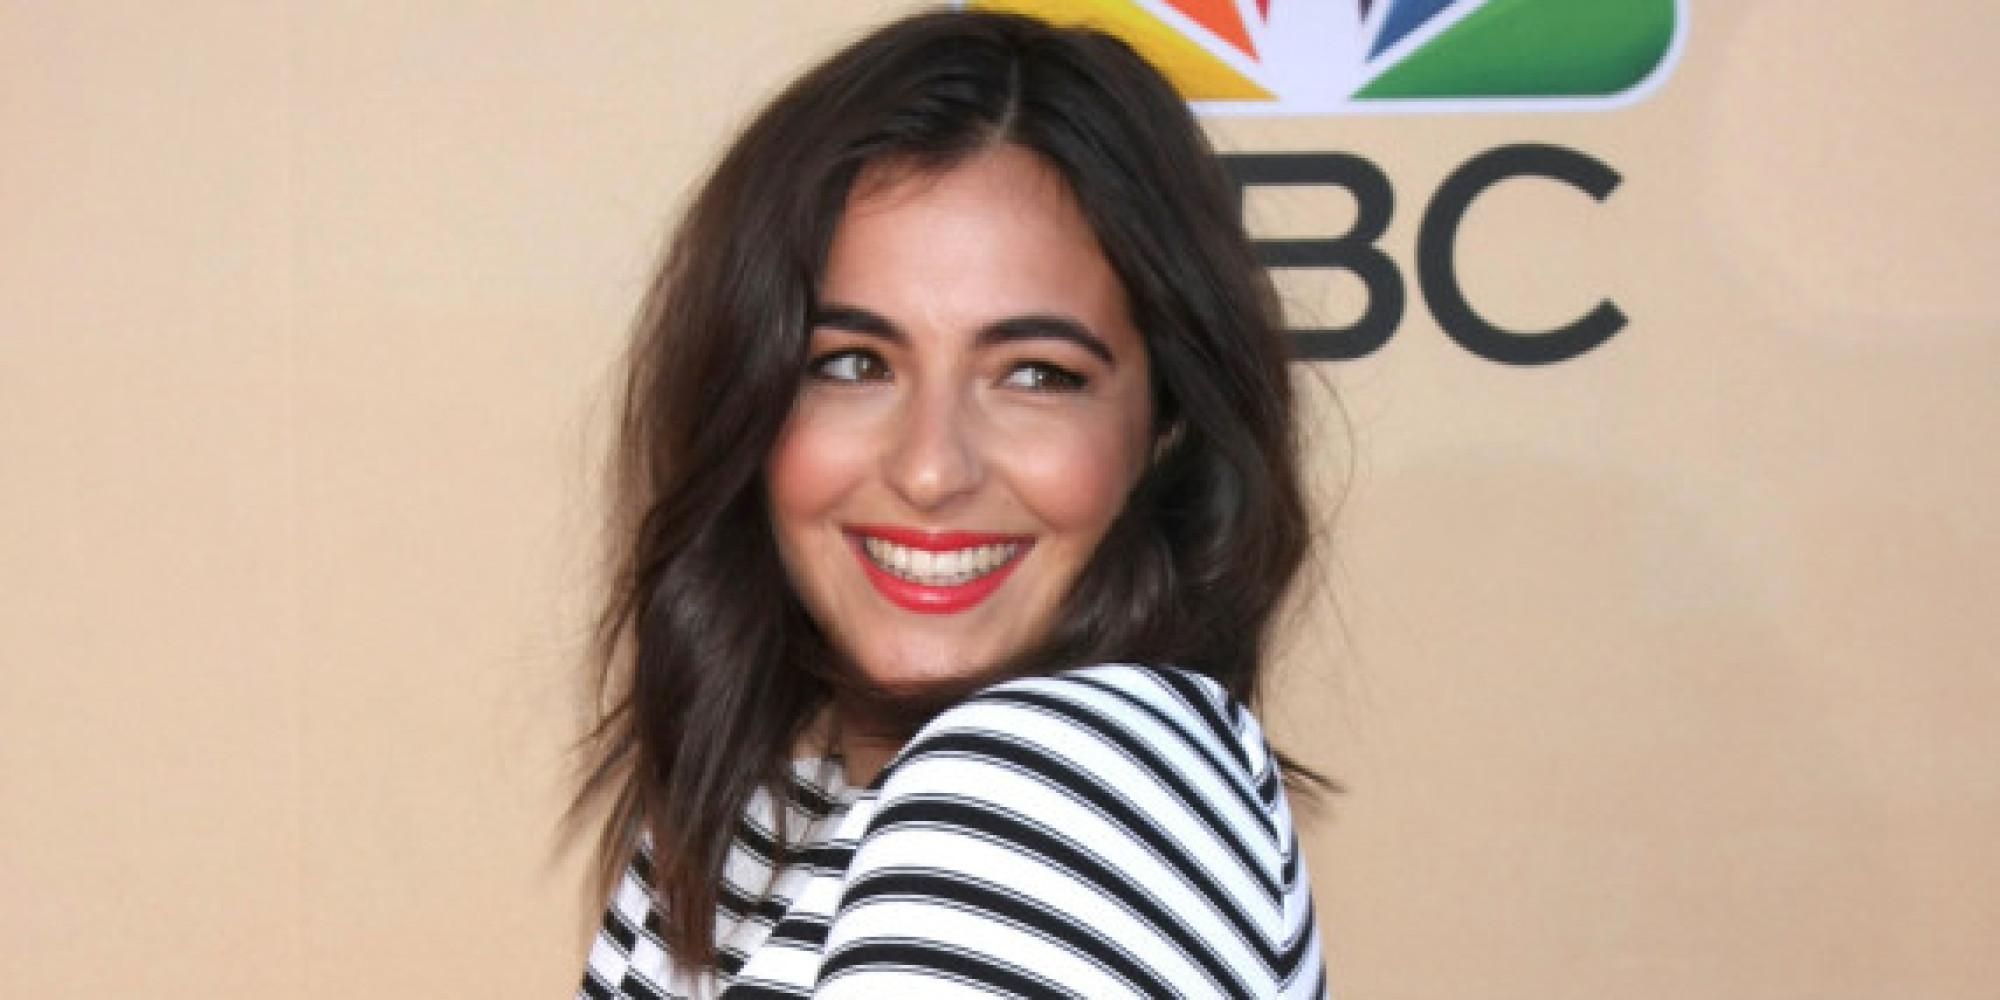 Camila cabello close up 4 - 2019 year